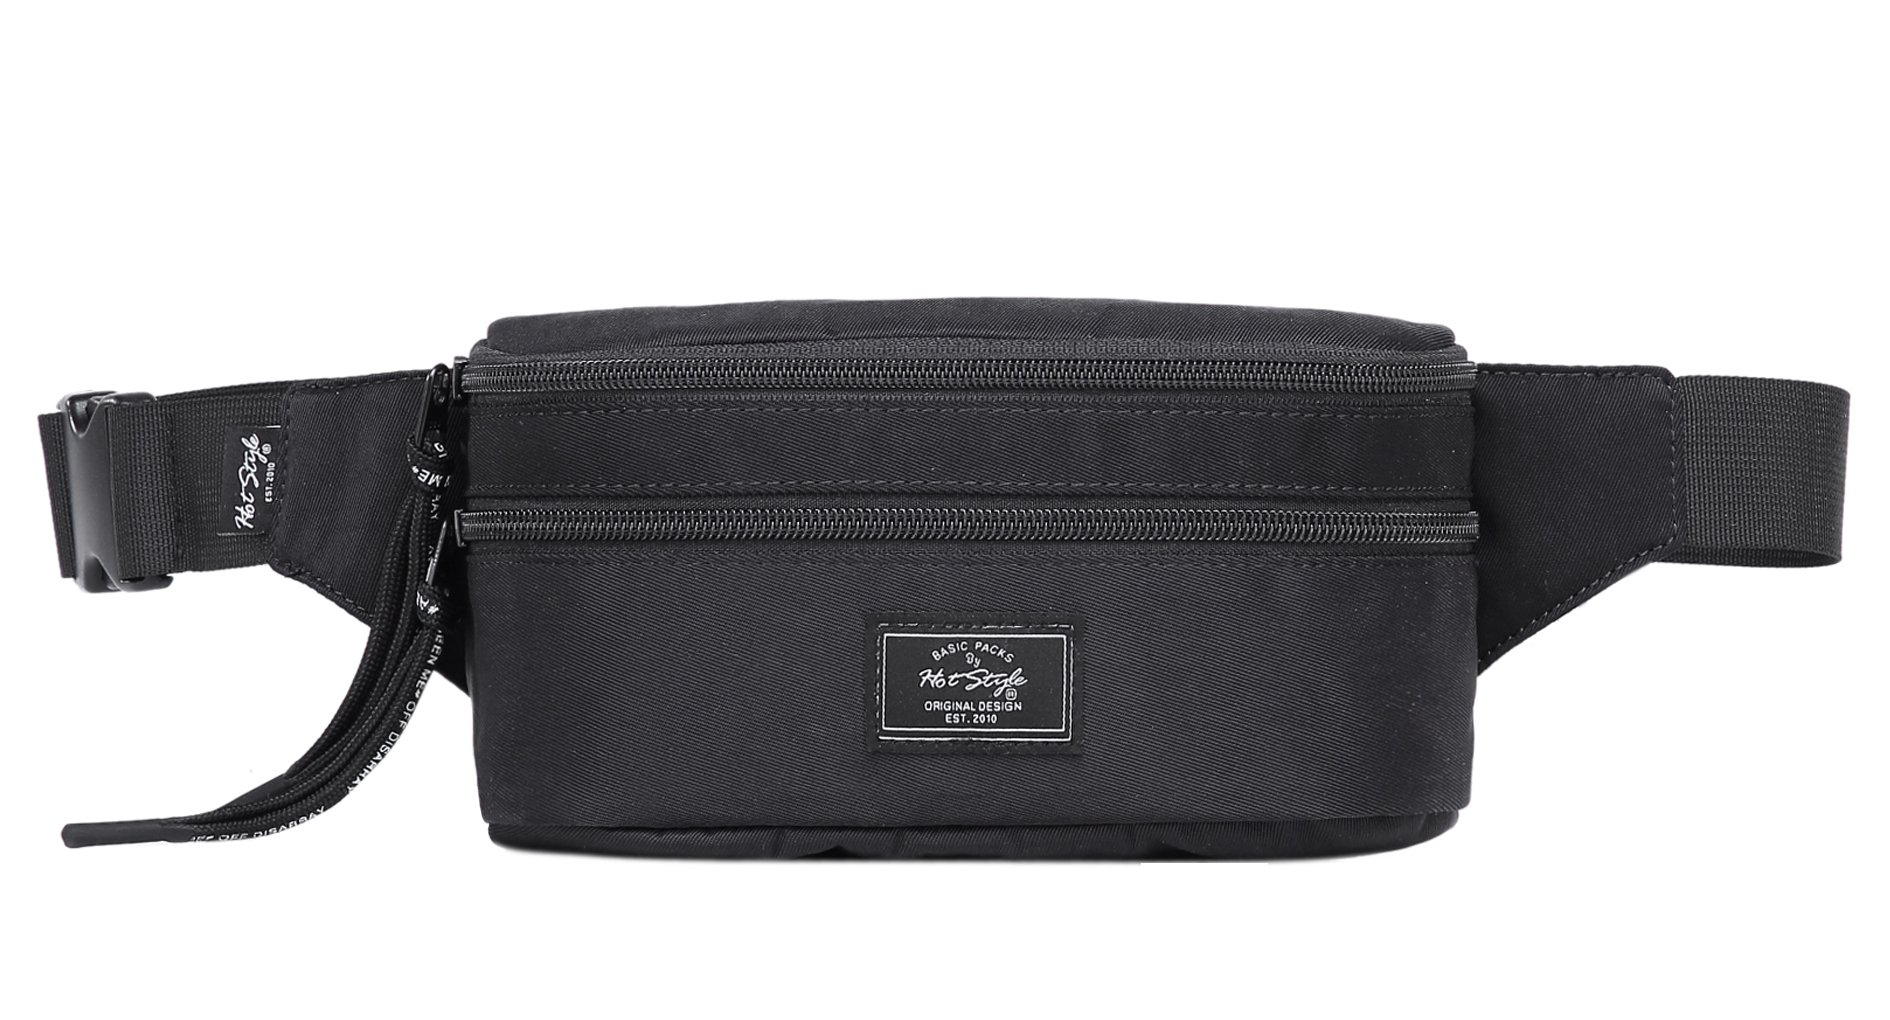 521s Fashion Waist Bag Cute Fanny Pack | 8.0''x2.5''x4.3'' | Black